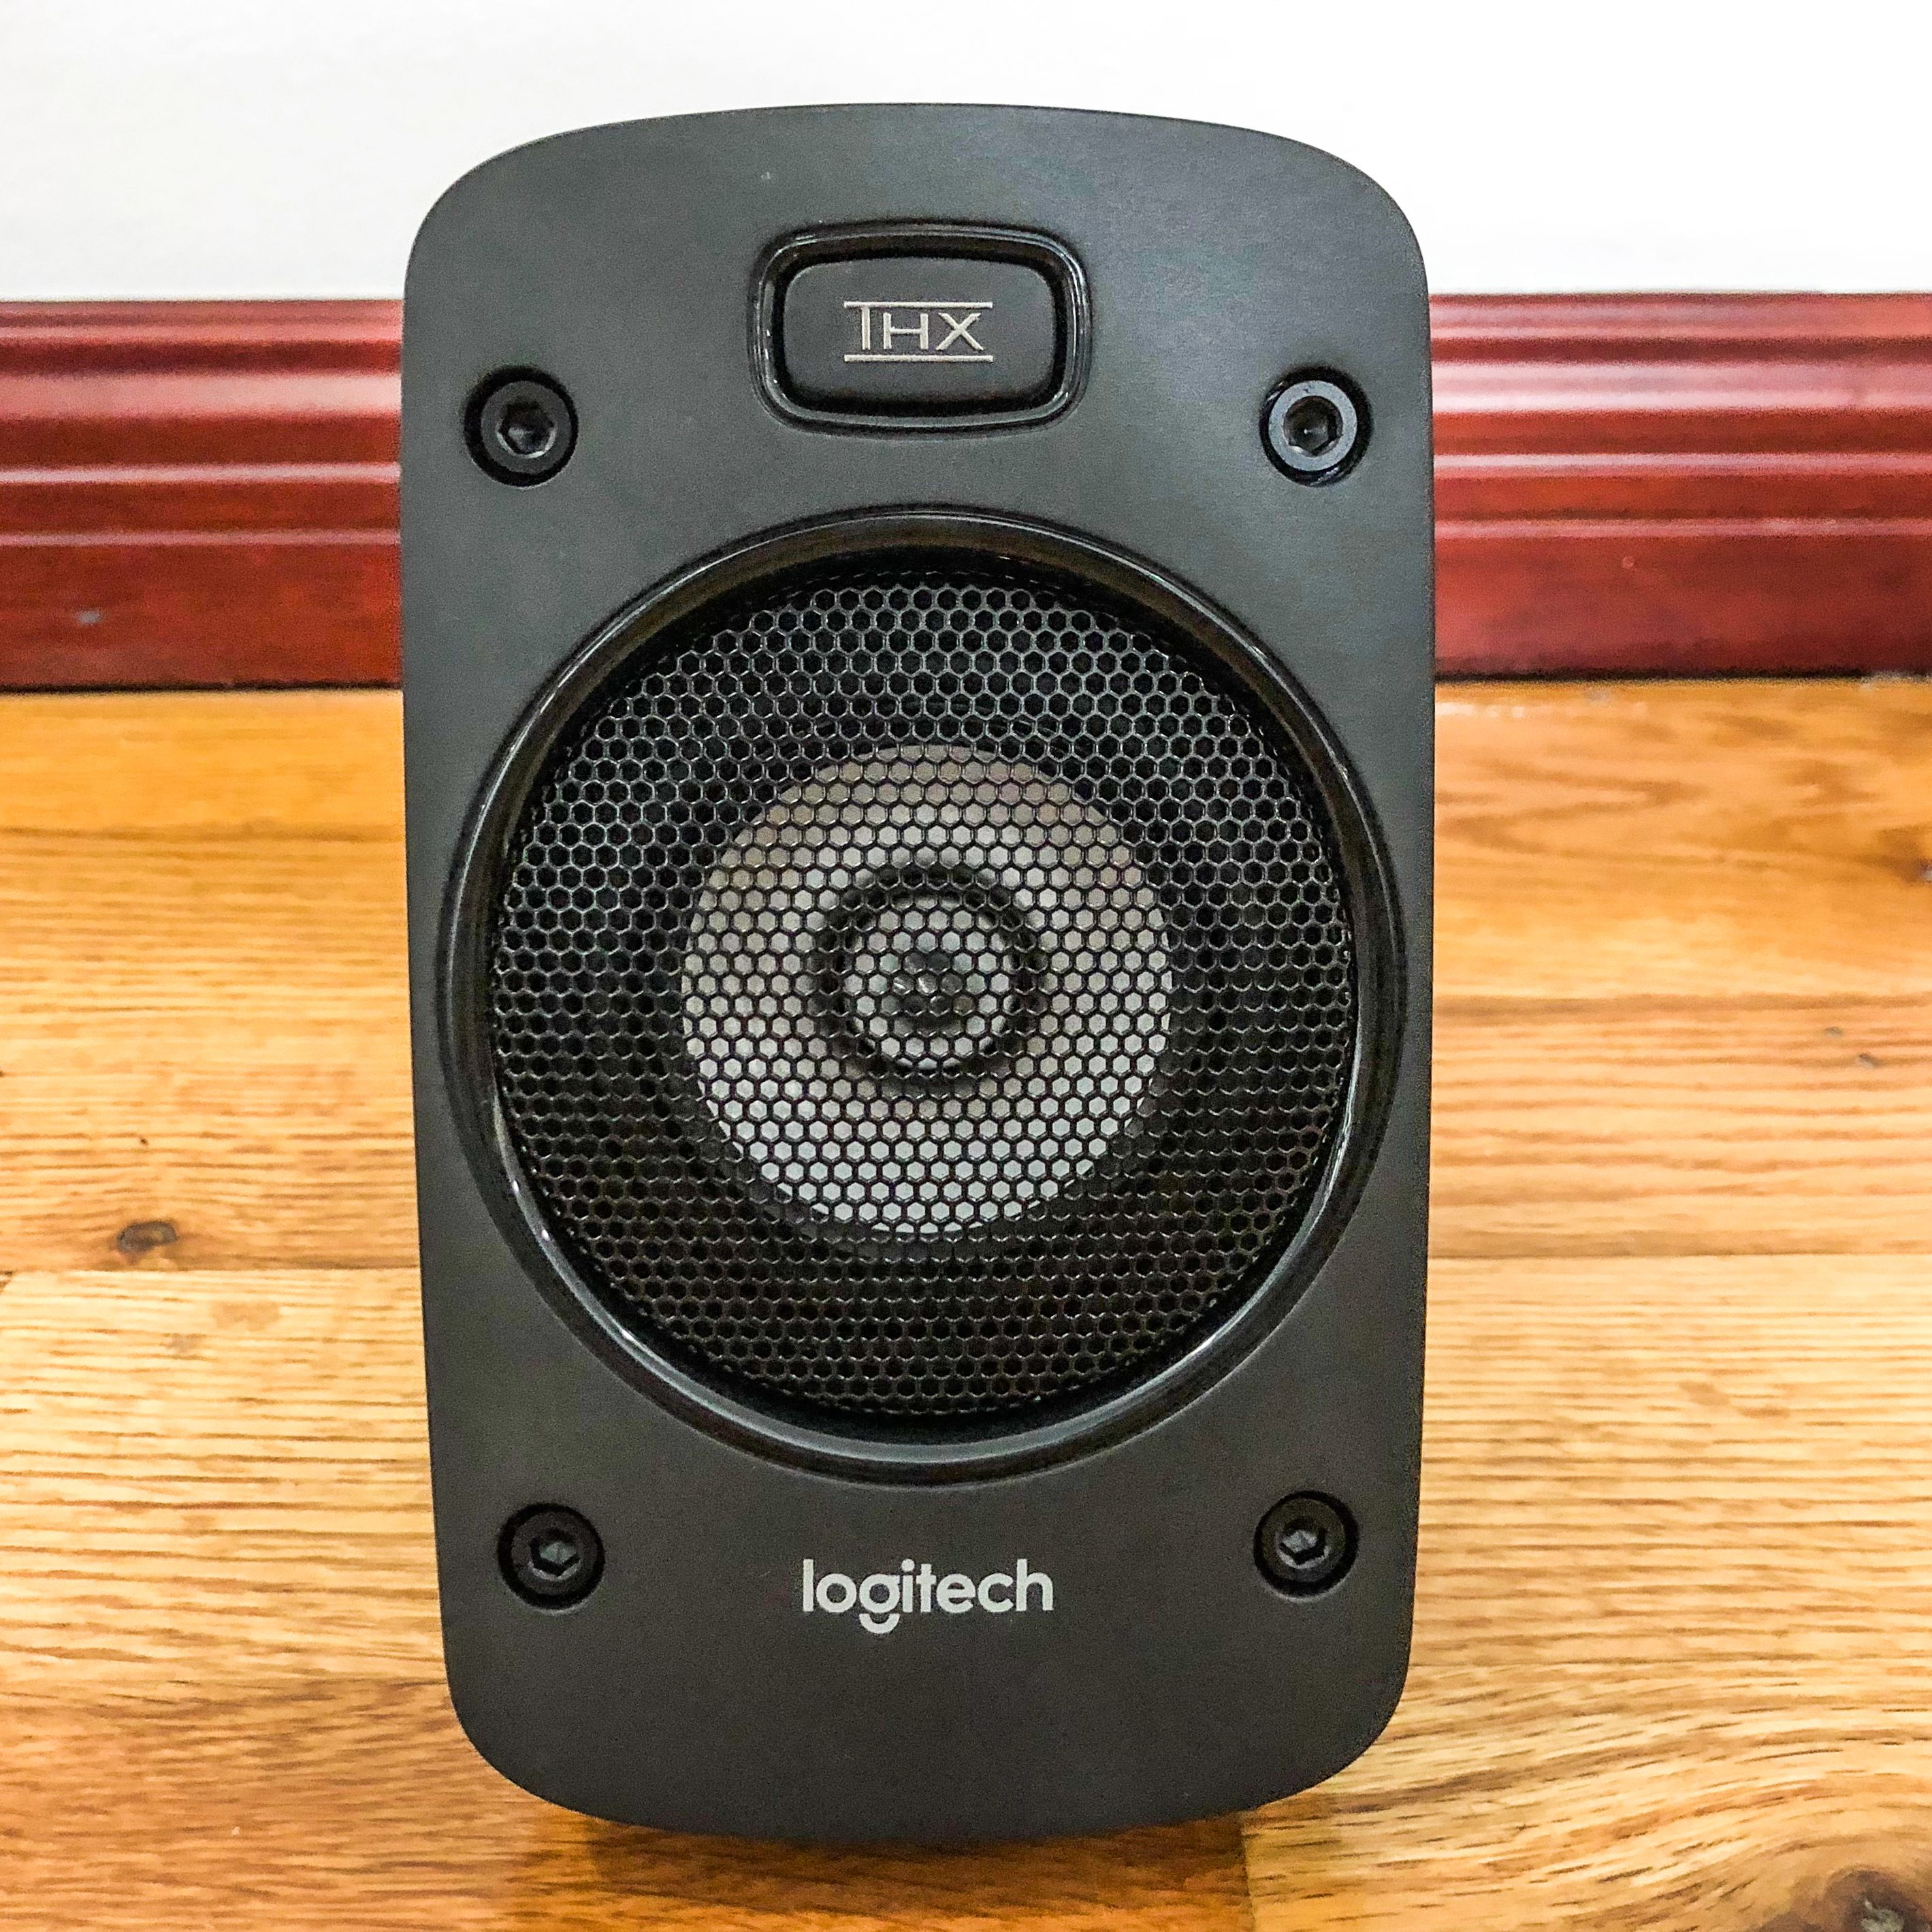 The 10 Best Surround Sound Speakers of 2019